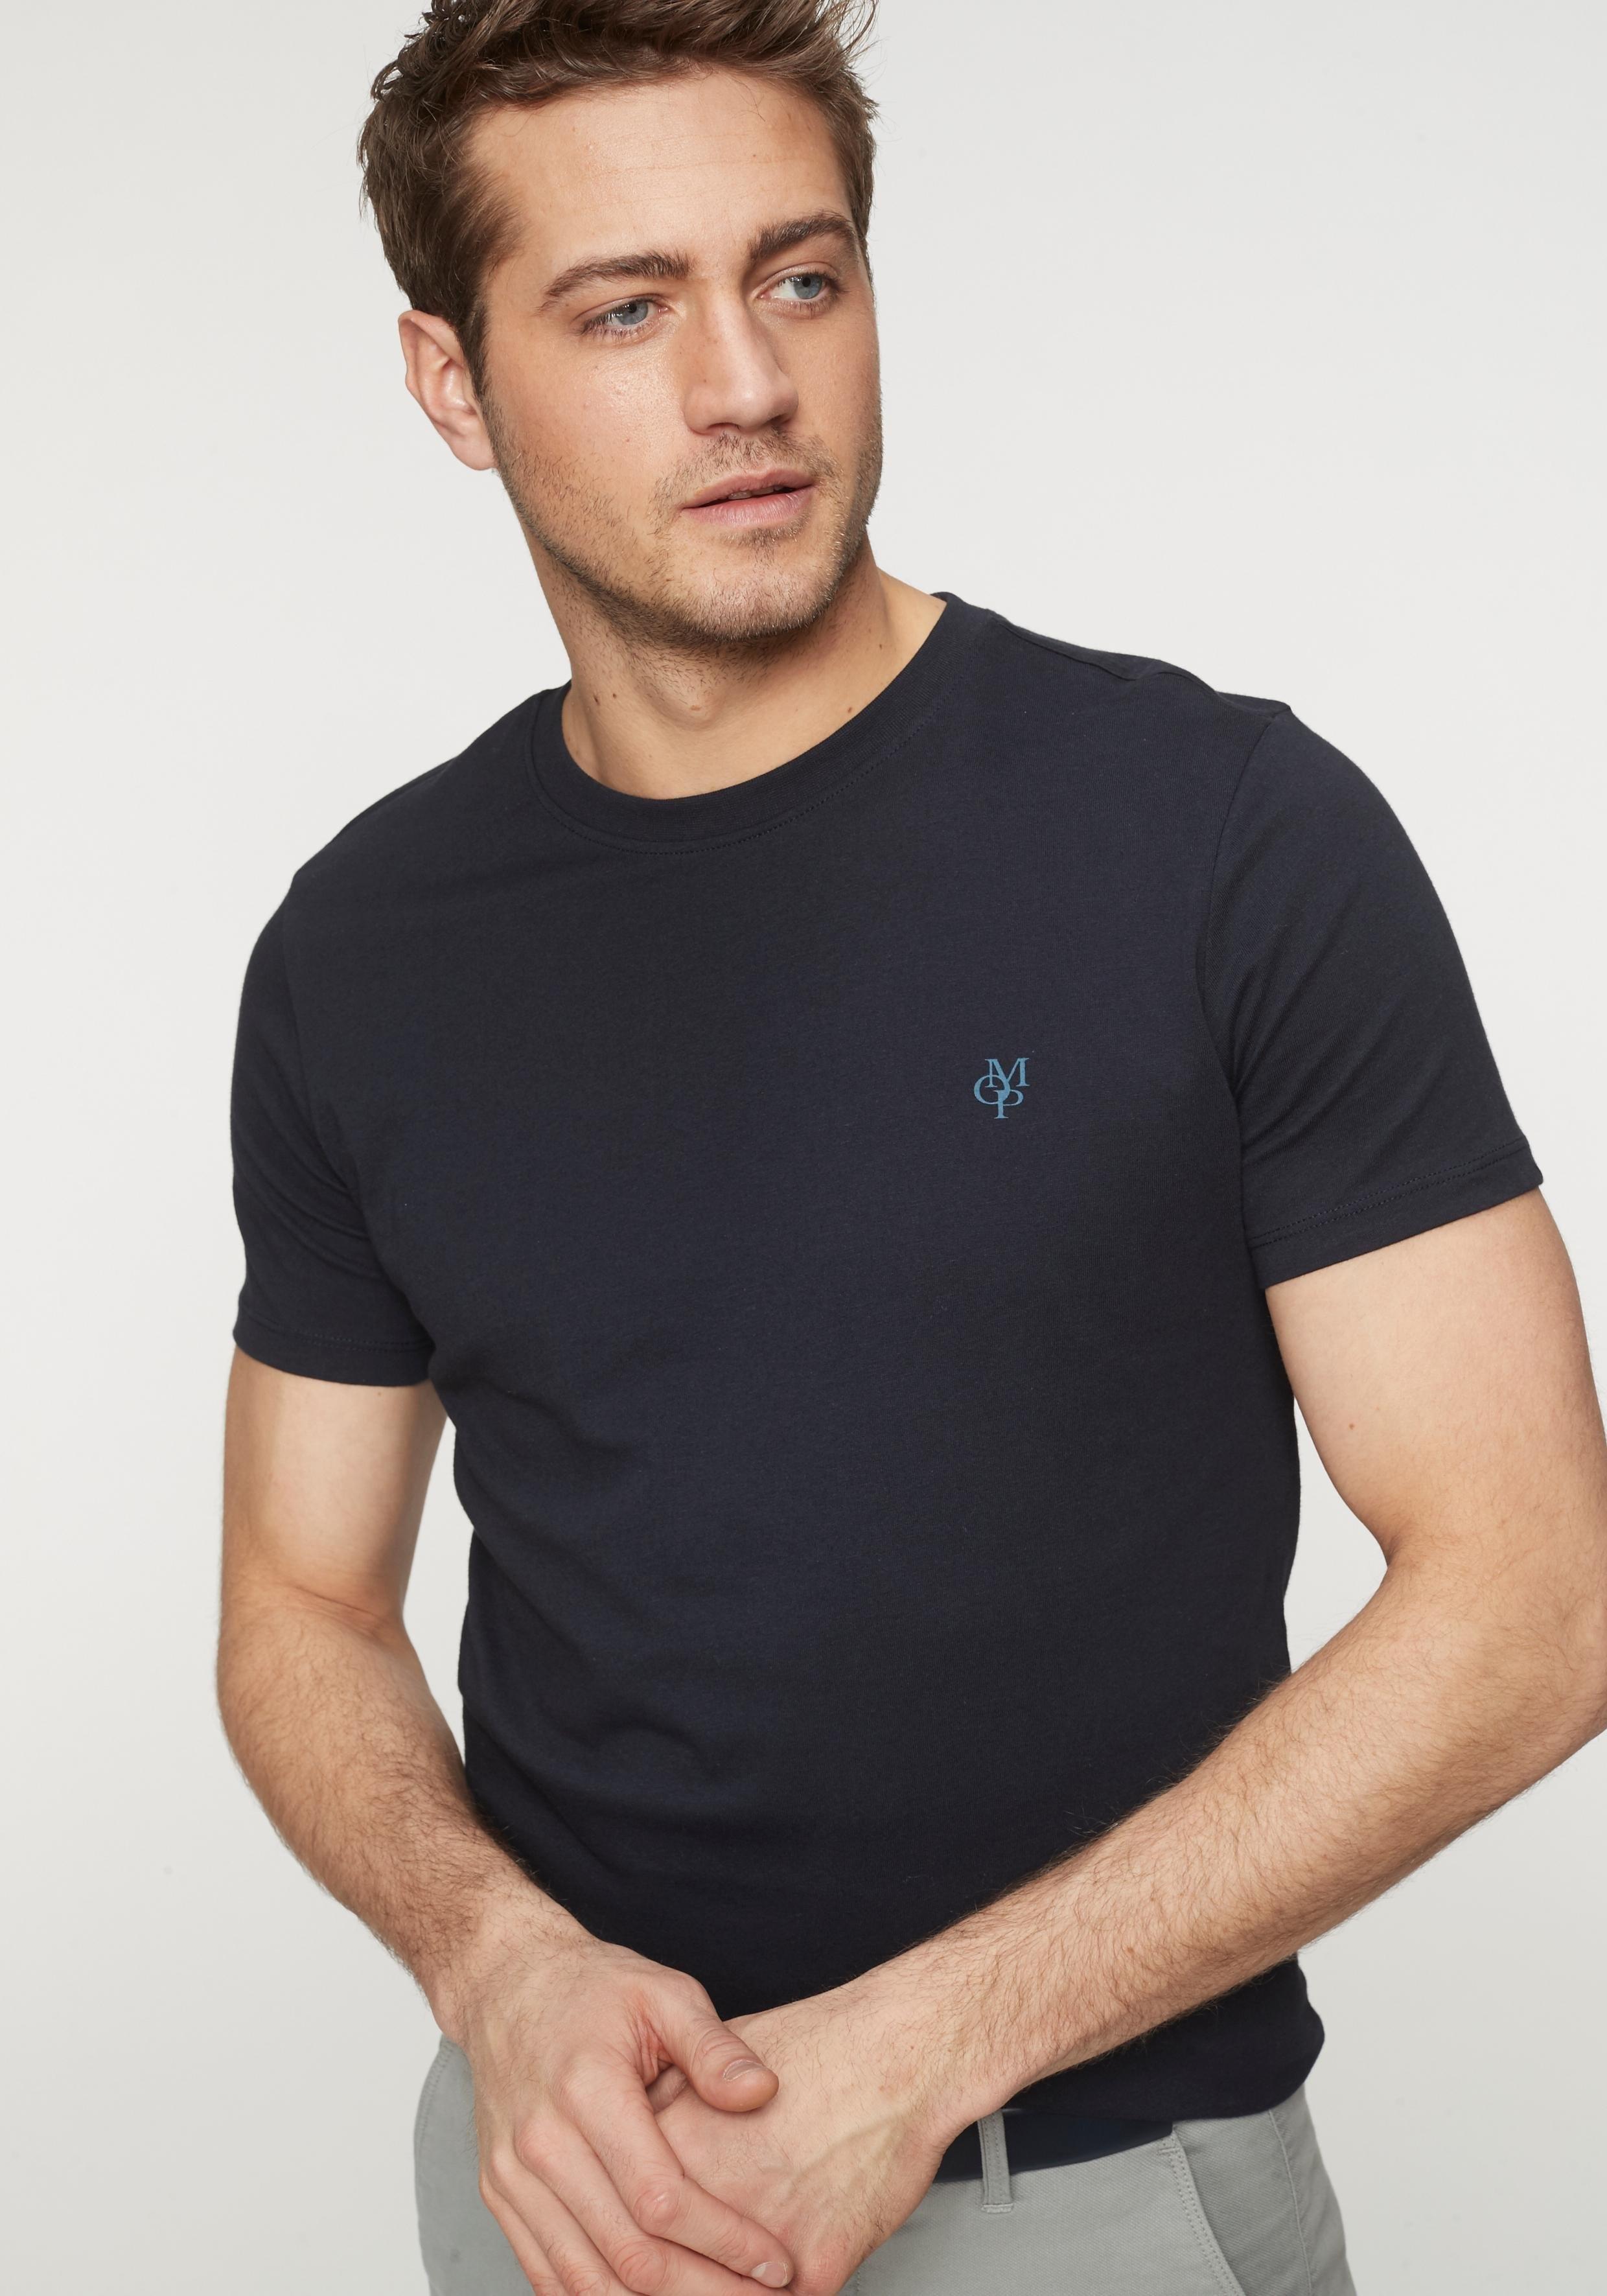 Marc O'Polo T-shirt online kopen op otto.nl